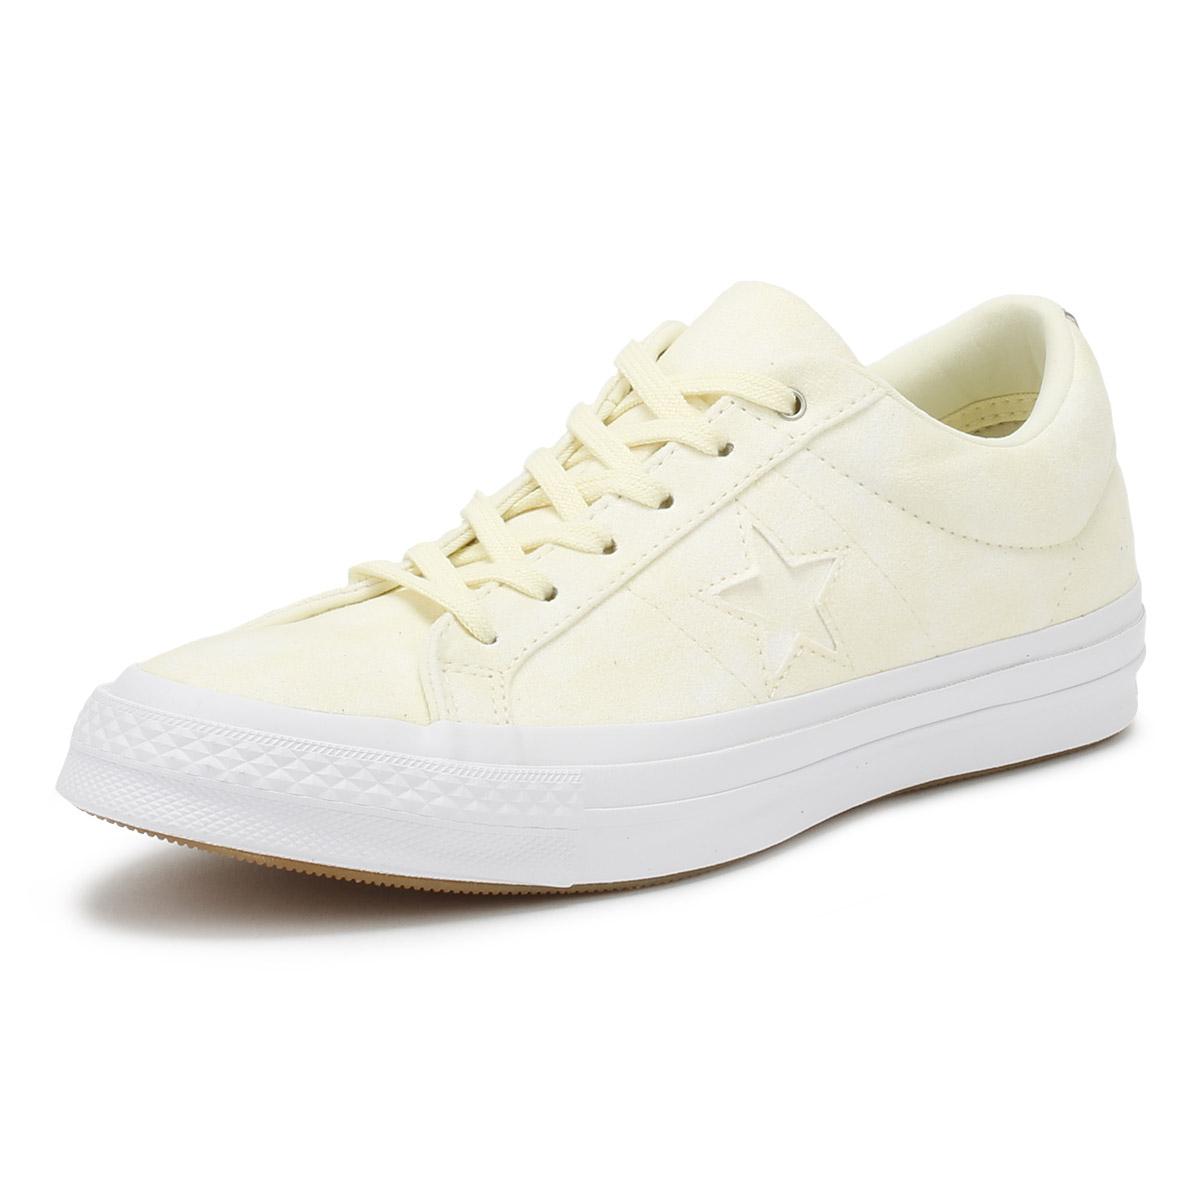 Converse One Star Damenschuhe Ox  Trainers Vapor Lemon Canvas  Ox Lace Up Skate Schuhes 12da8d